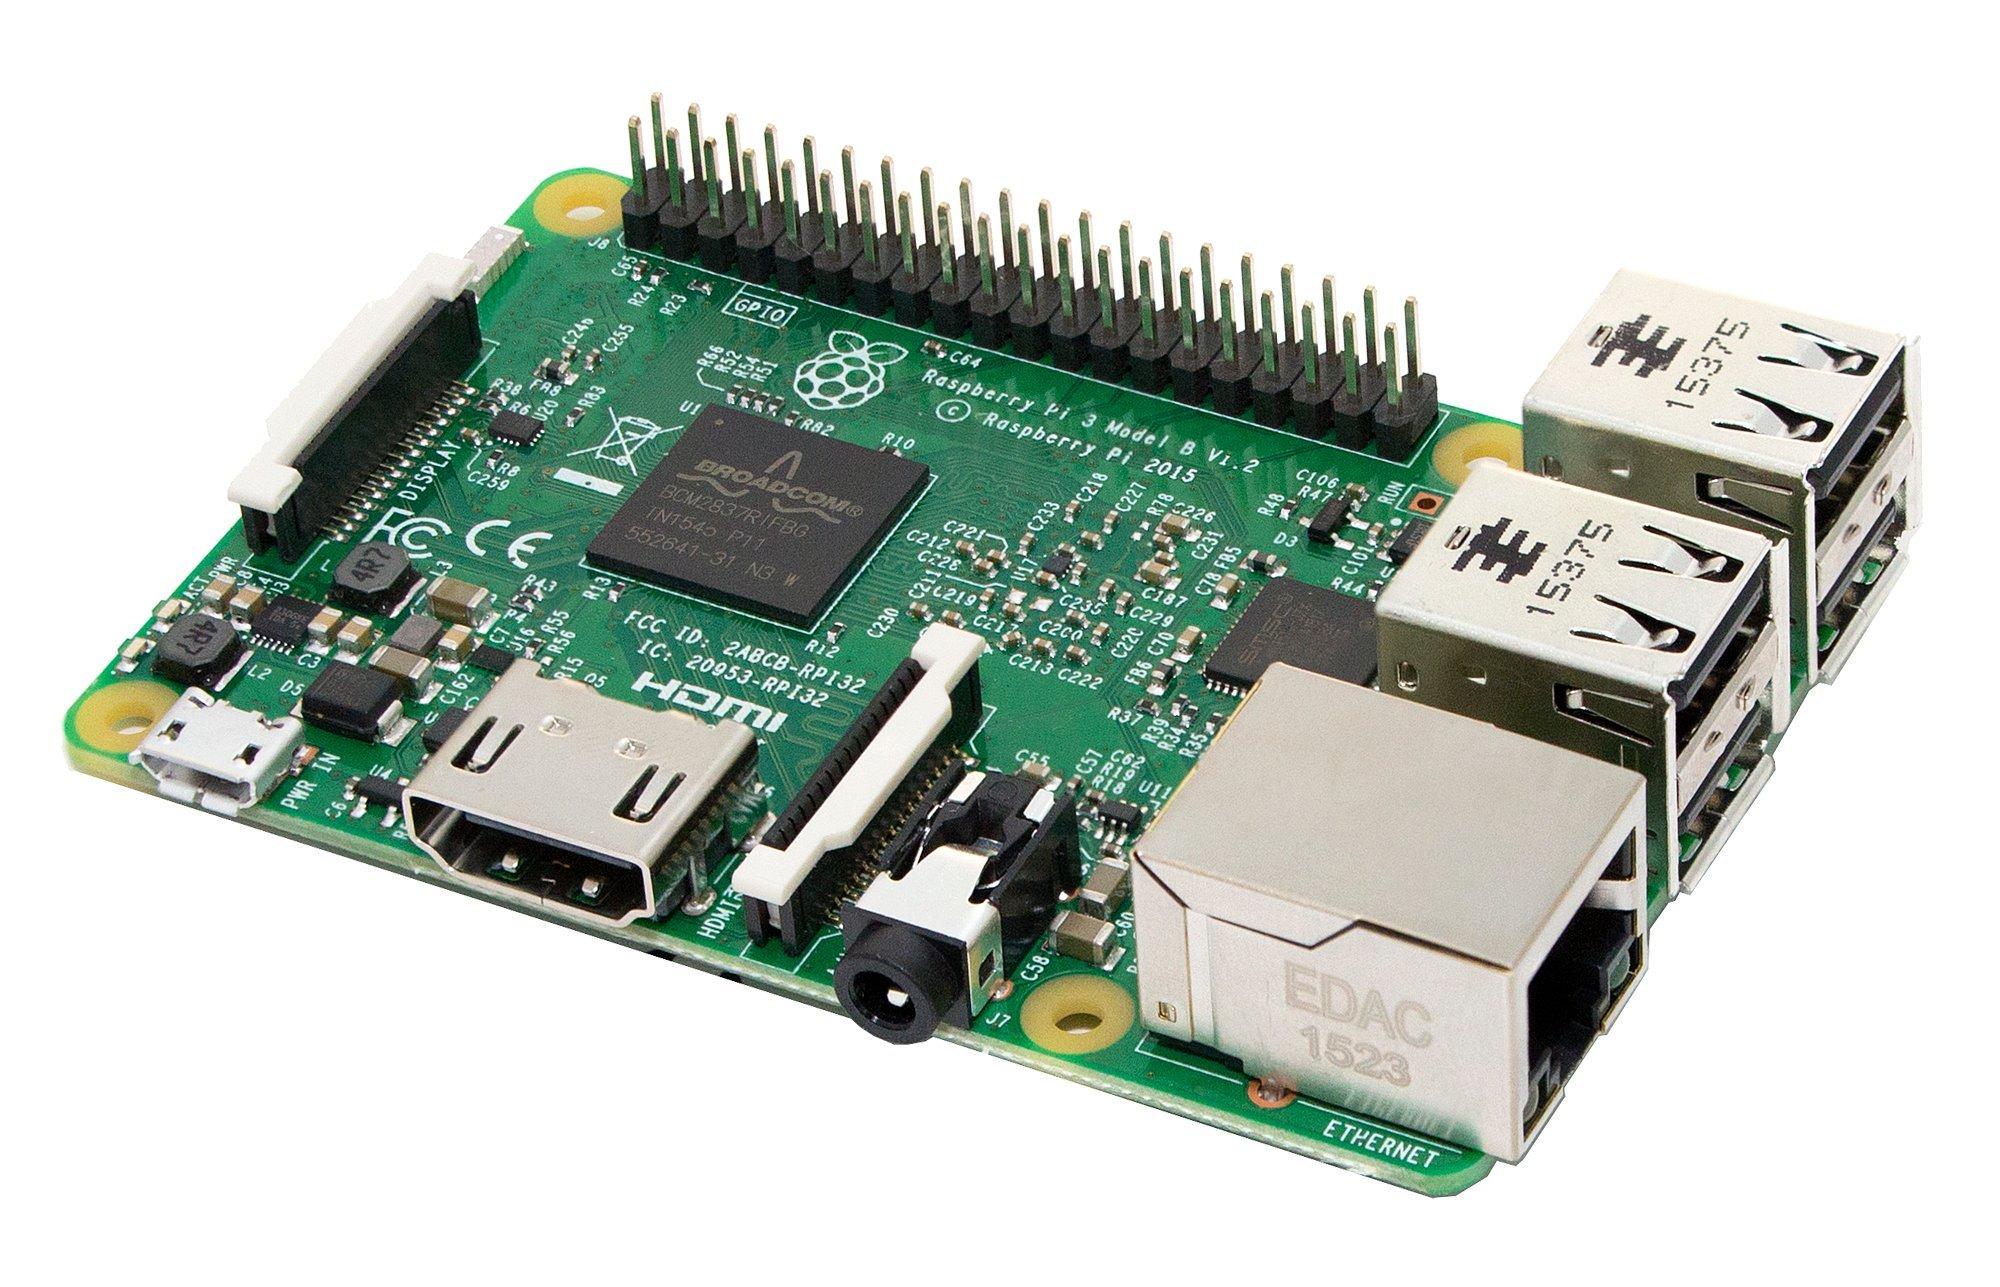 Raspberry Pi 3 Model B Motherboard by Raspberry Pi